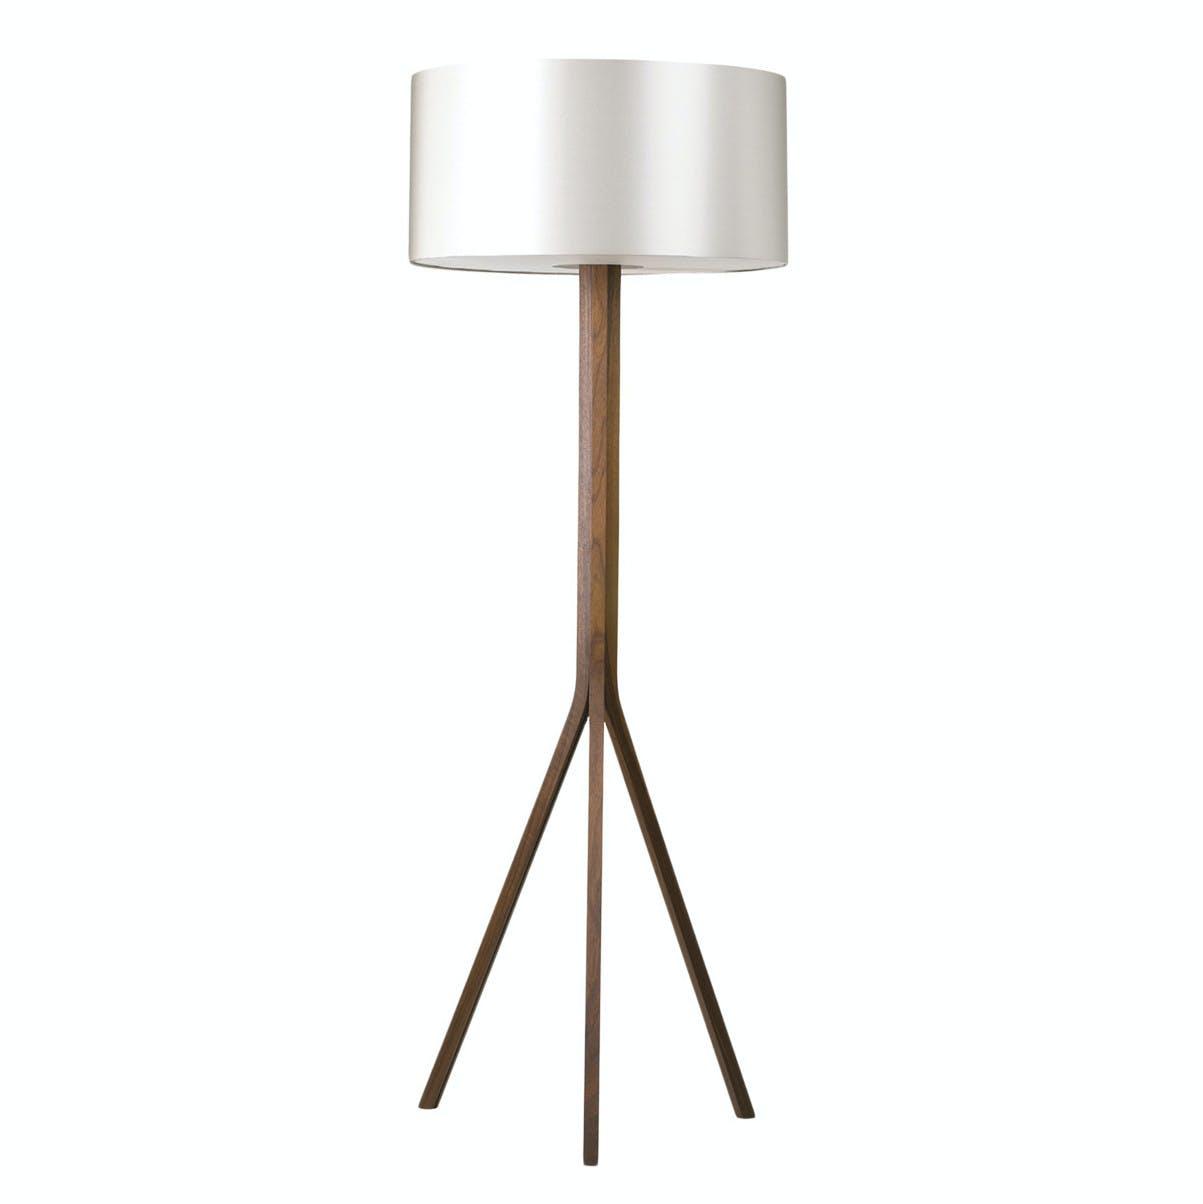 Cto Lighting Trico Floor Haute Living 181112 150321